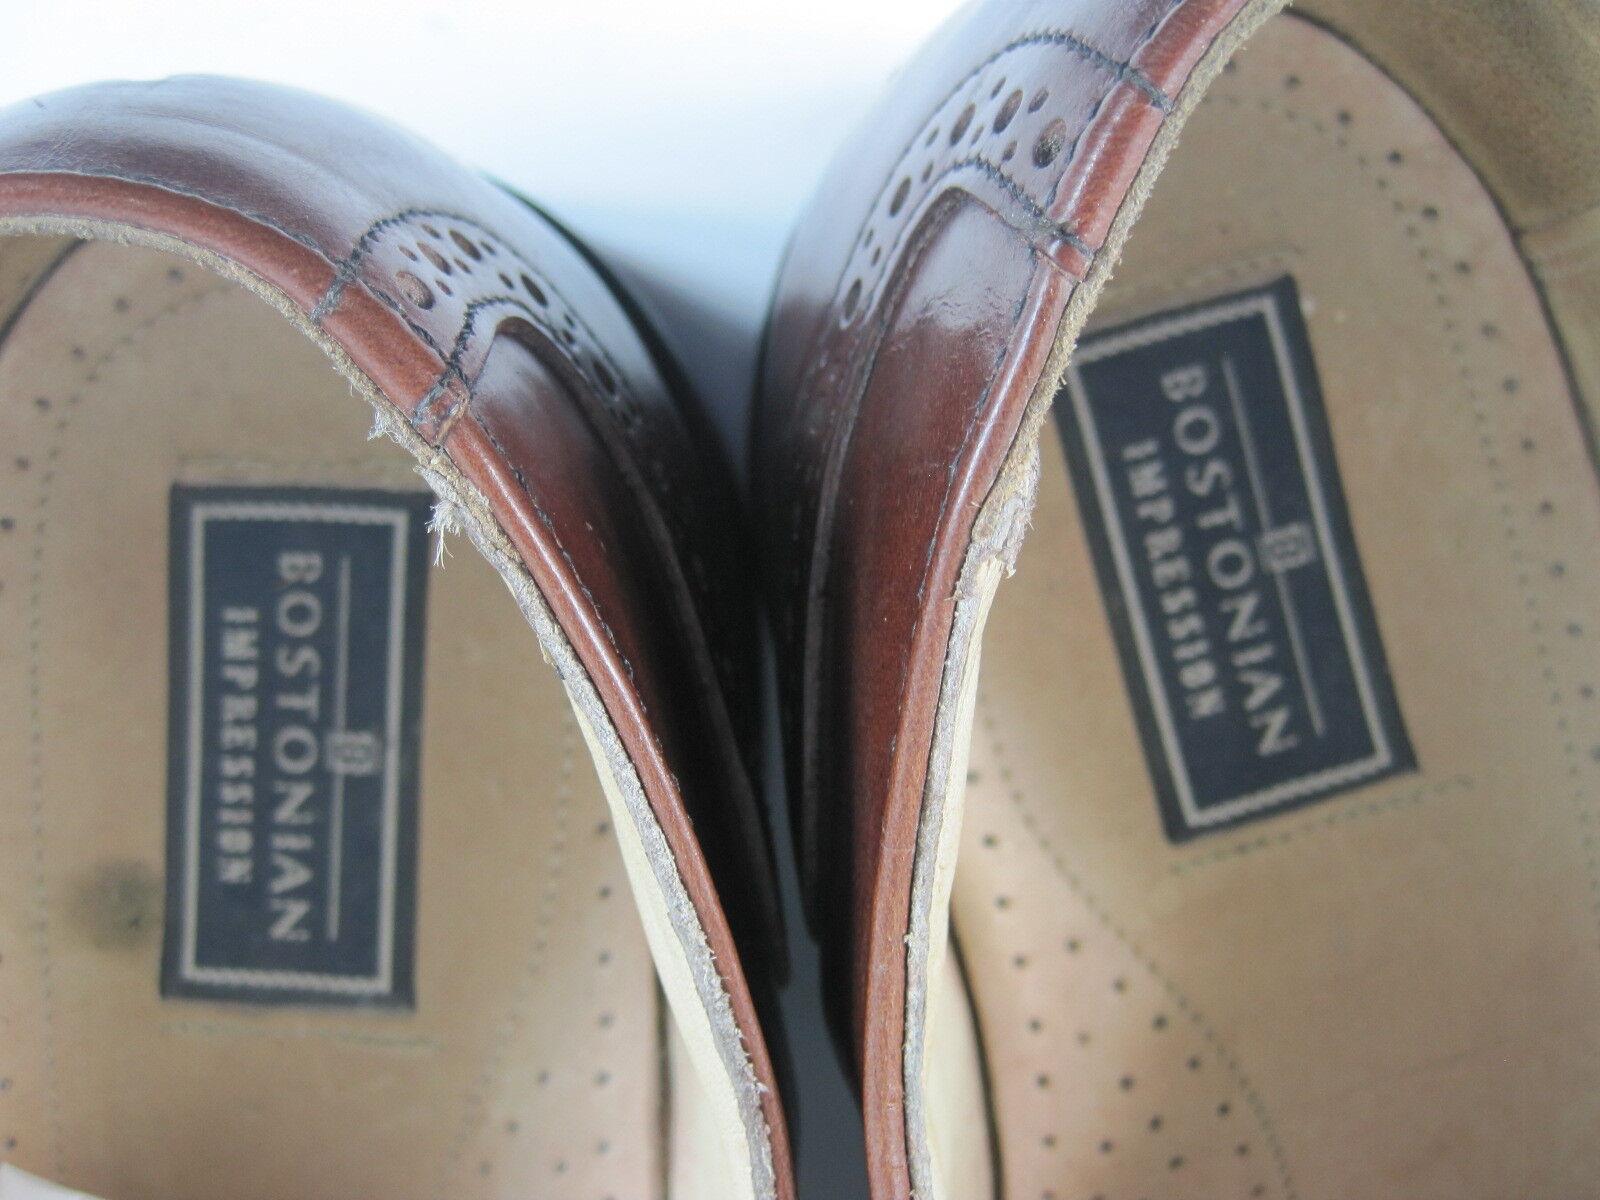 Bostonian Impression Impression Impression Men schuhe Cap Toe Oxford Leather Größe 10 D B braun Made USA d6a003